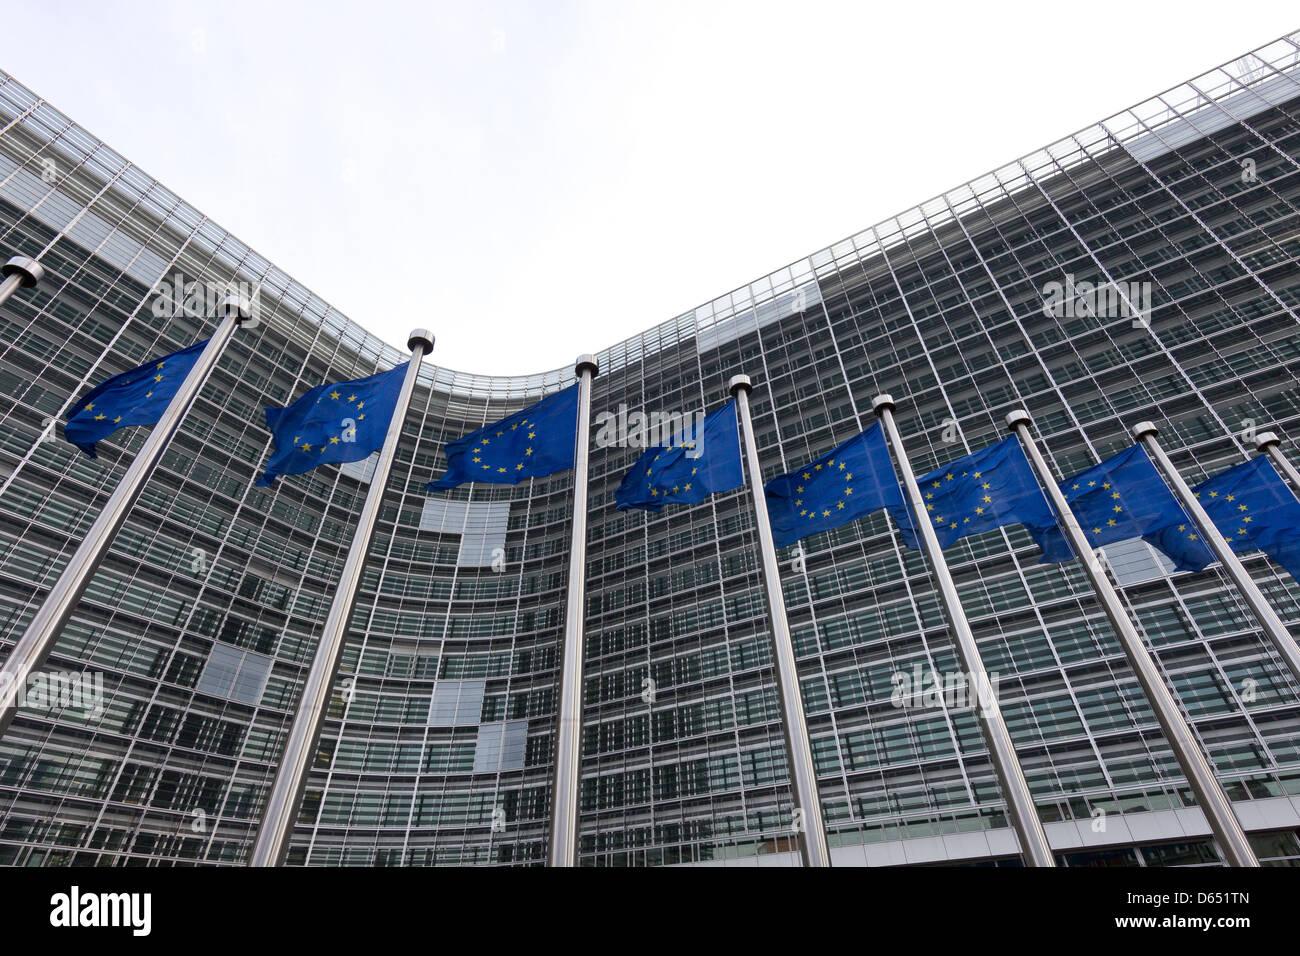 european flags - Stock Image